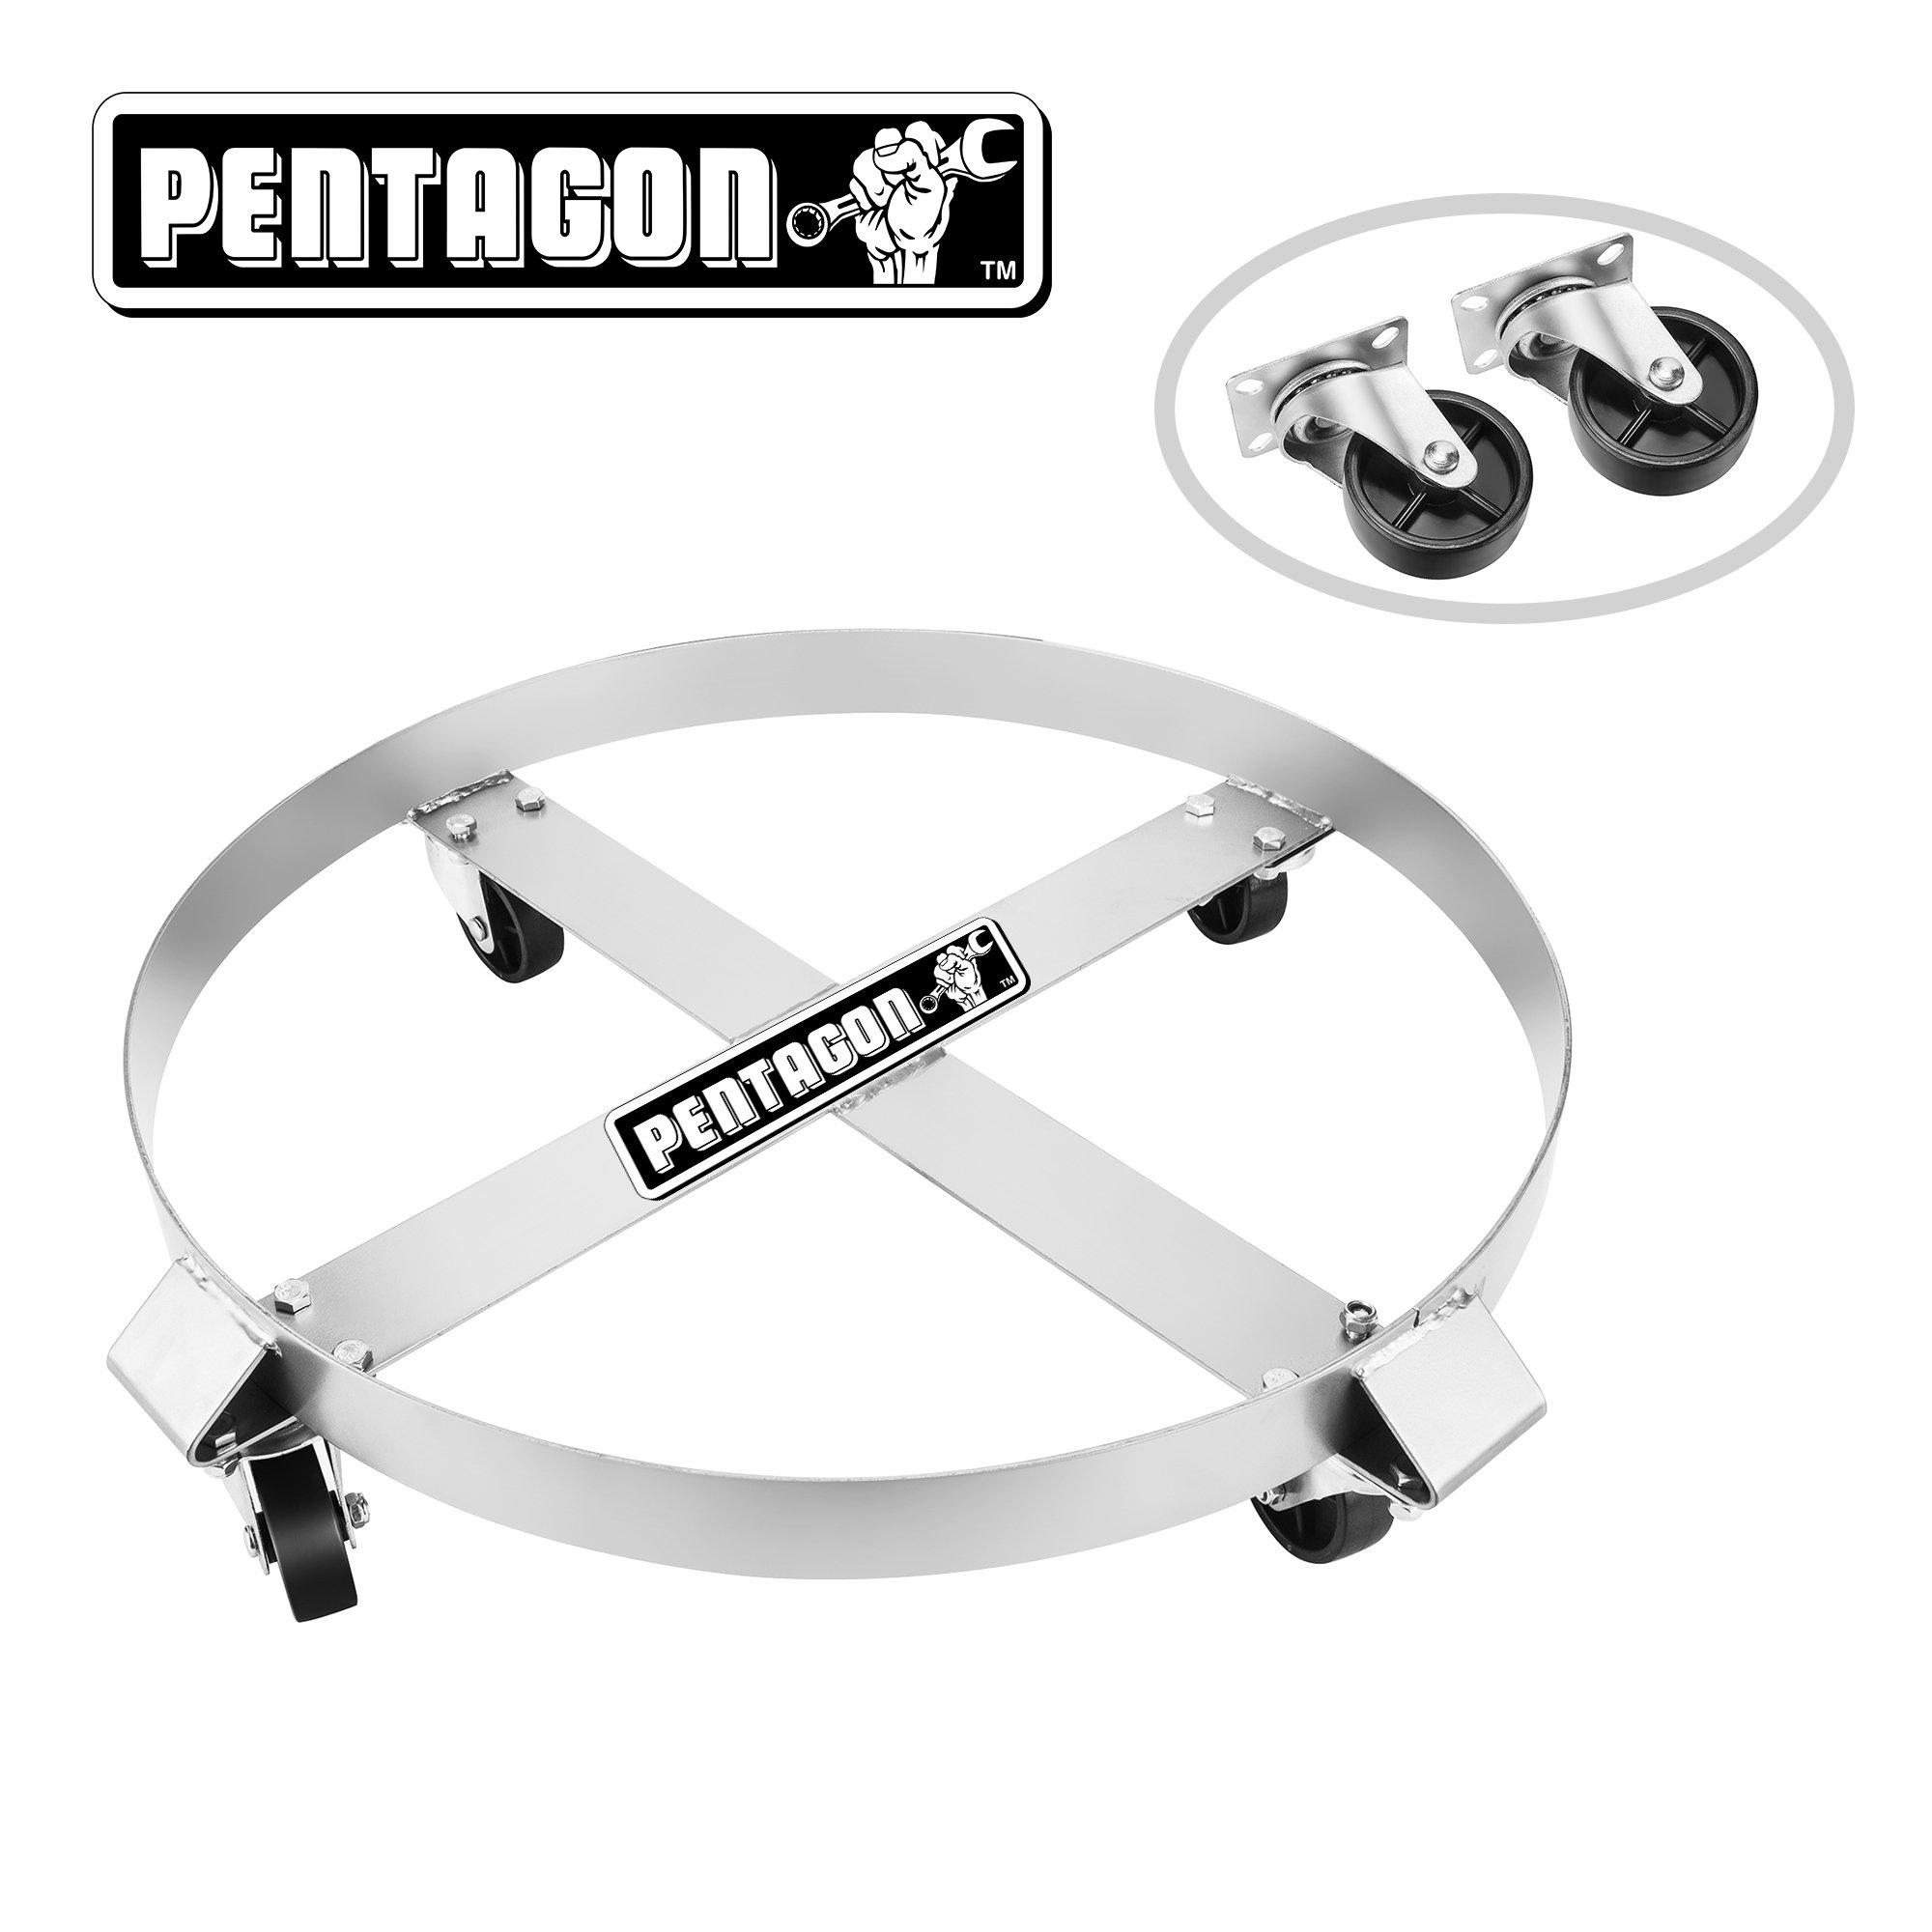 Pentagon 83-DT5493 Tool | Heavy Duty | 55-Gallon Drum Dolly | Single | Silver